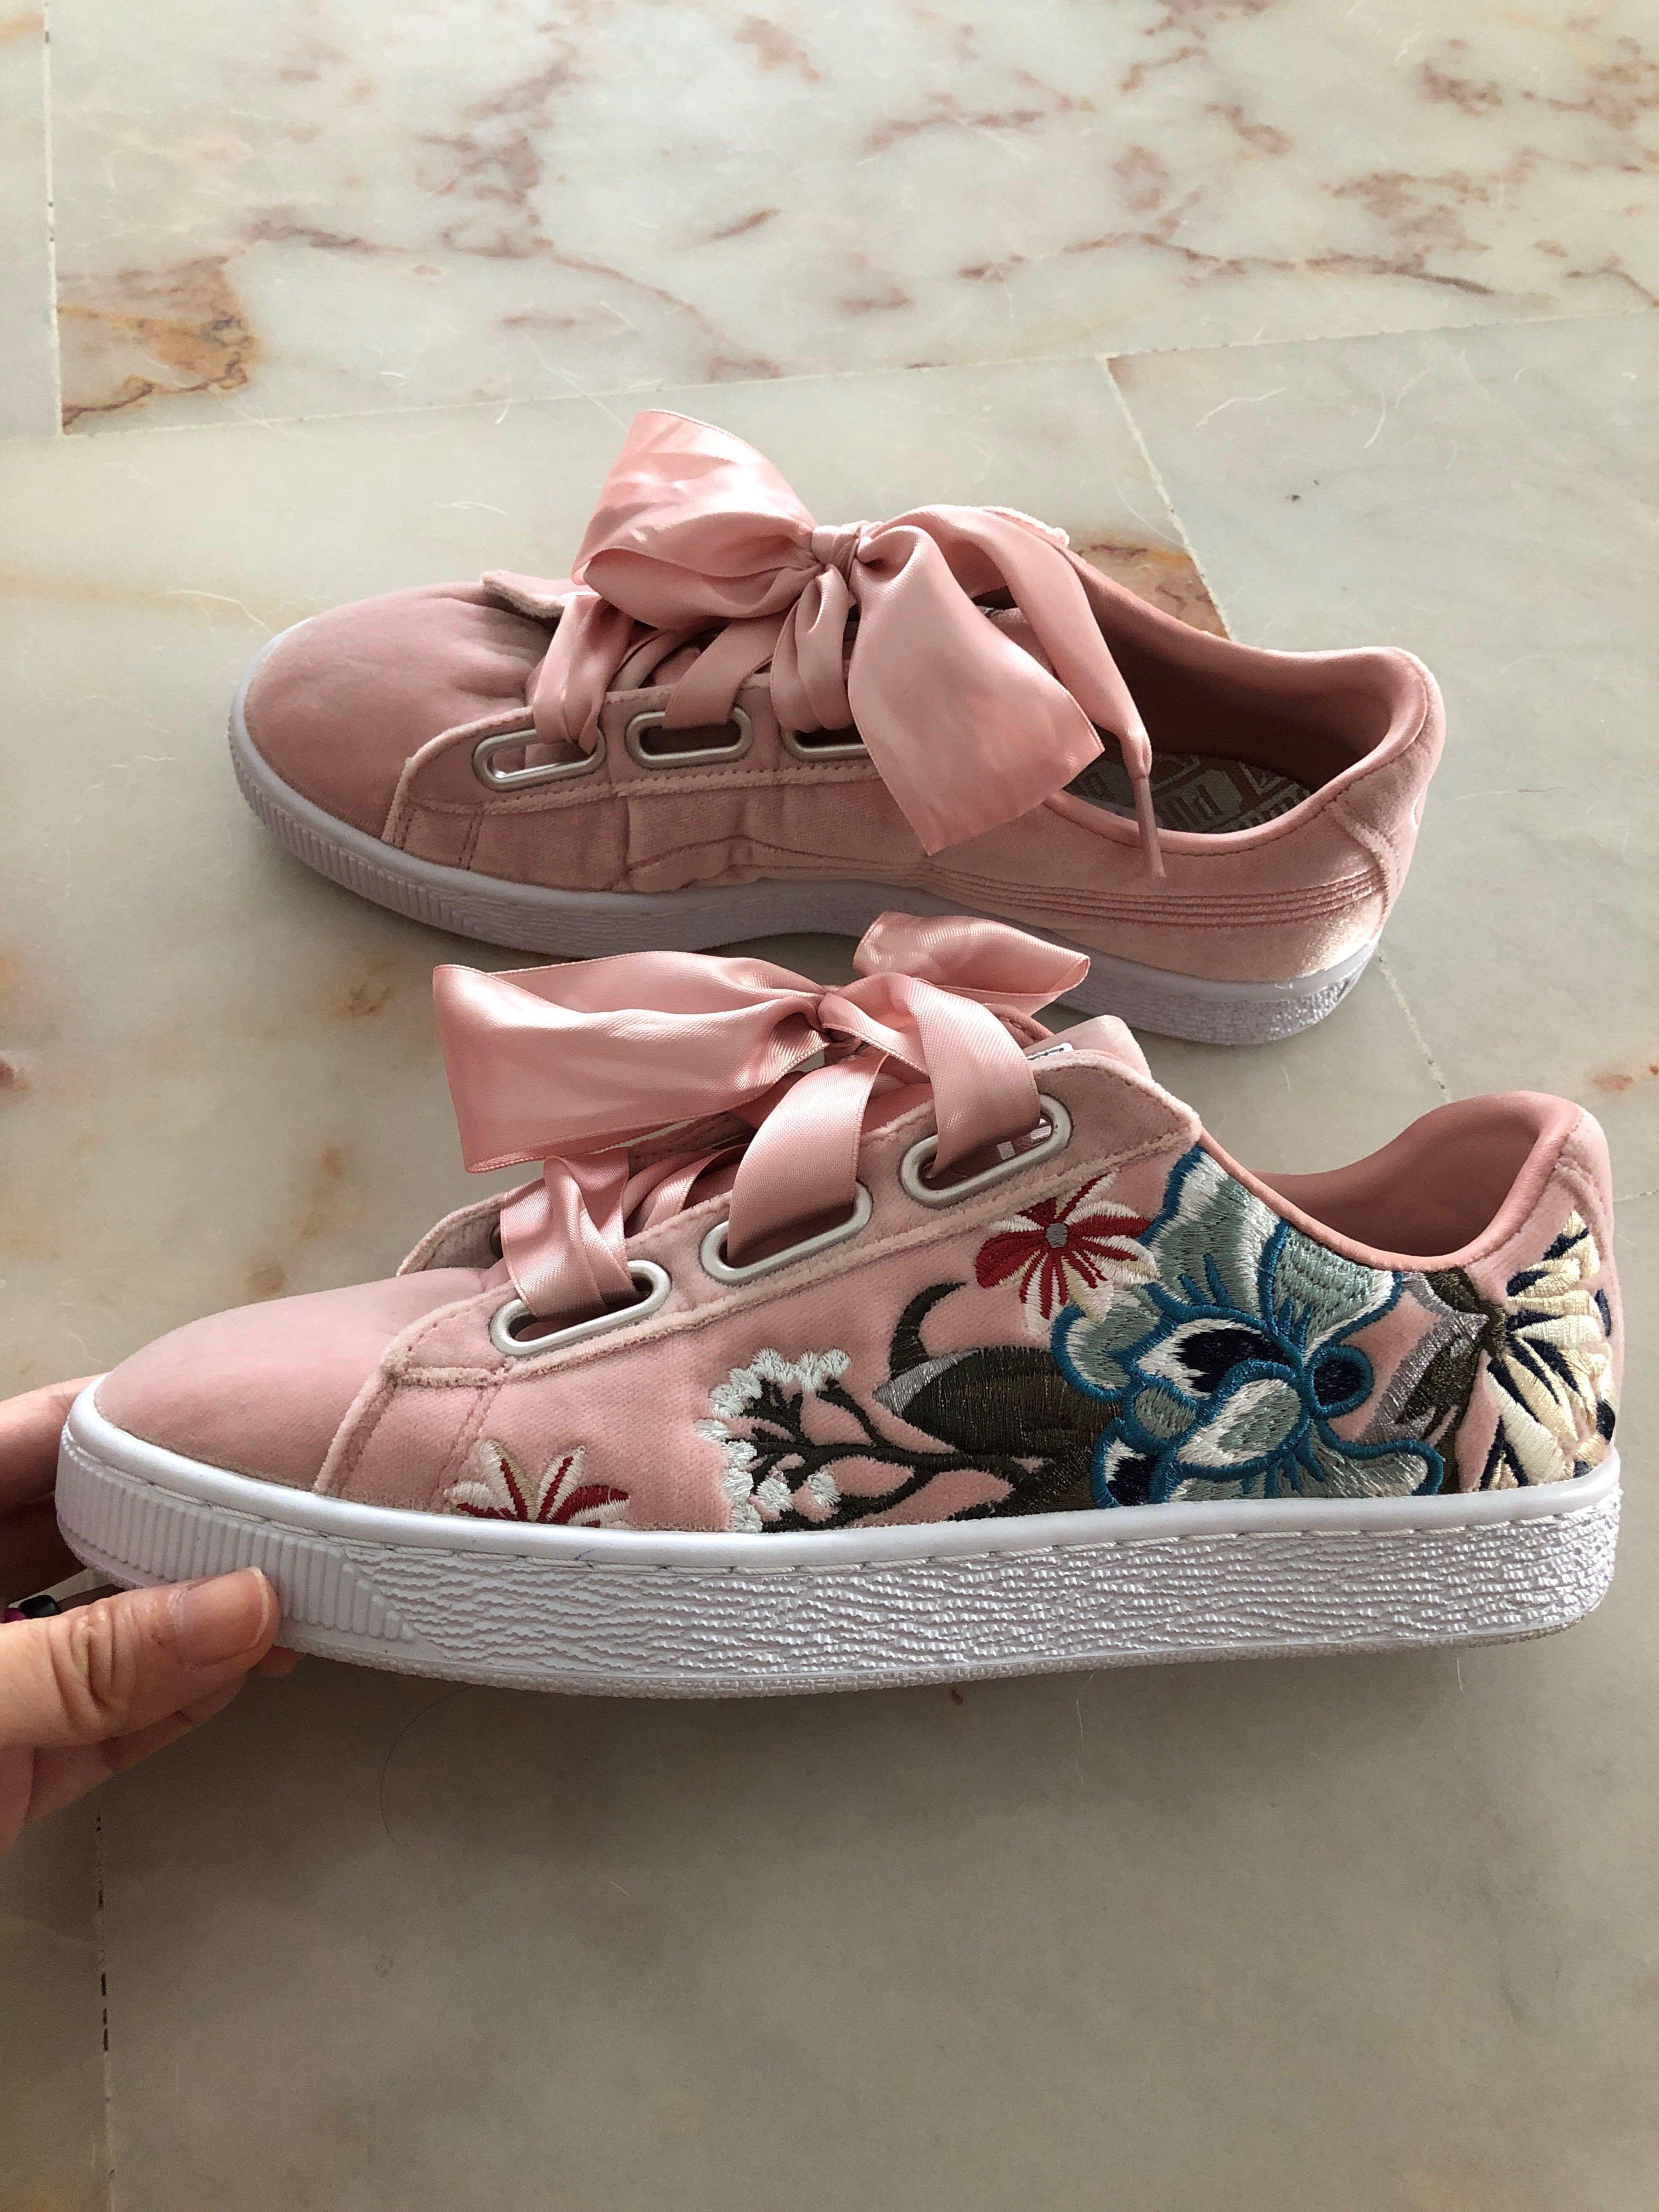 san francisco e11ec 27a9c Pink Puma basket heart shoes trainers with embroidery ...